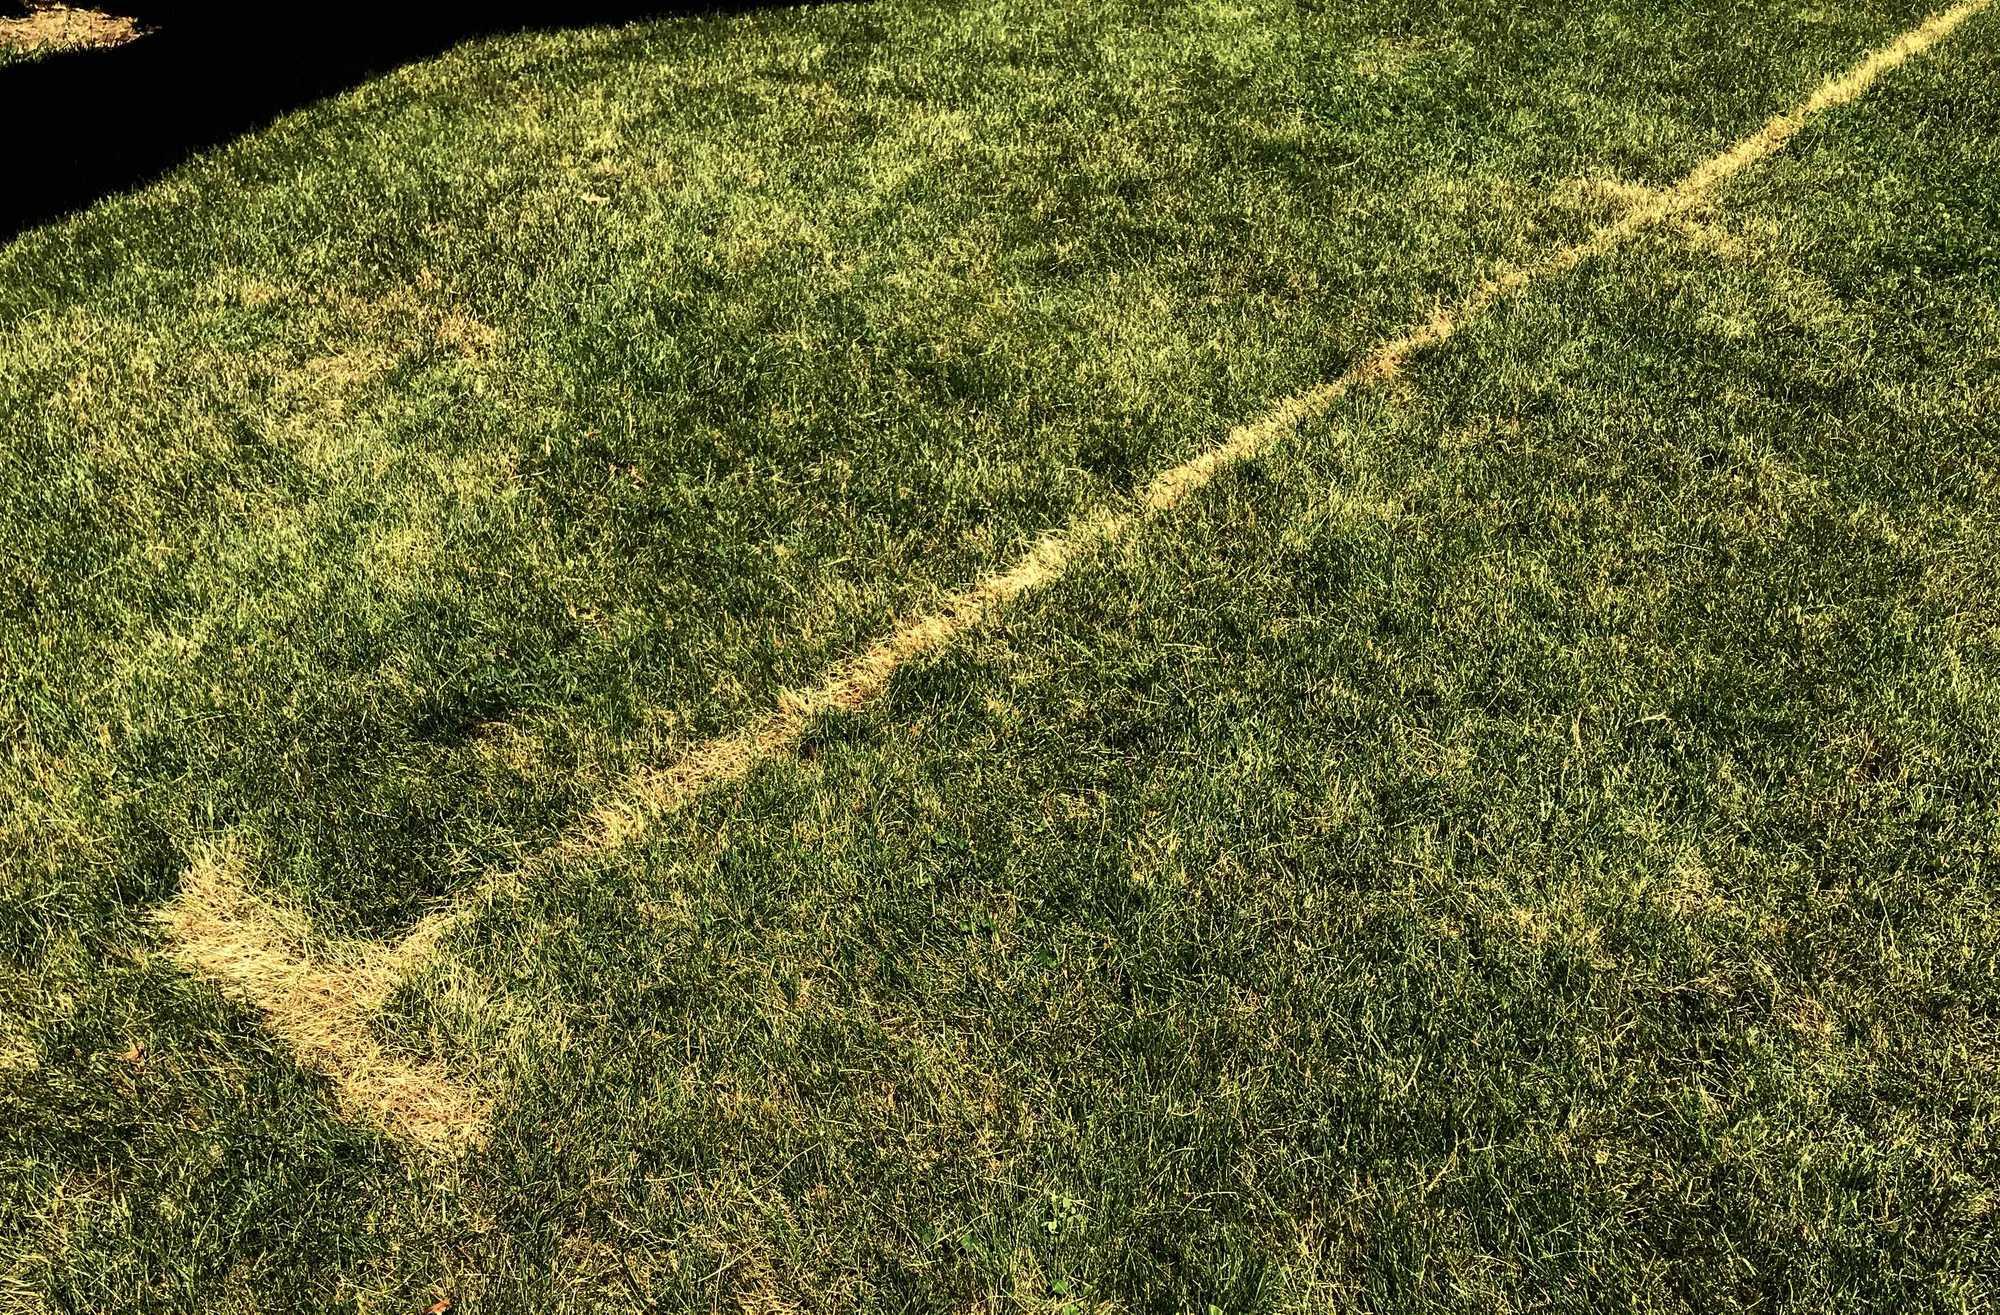 Dead Grass Under Weave Poles